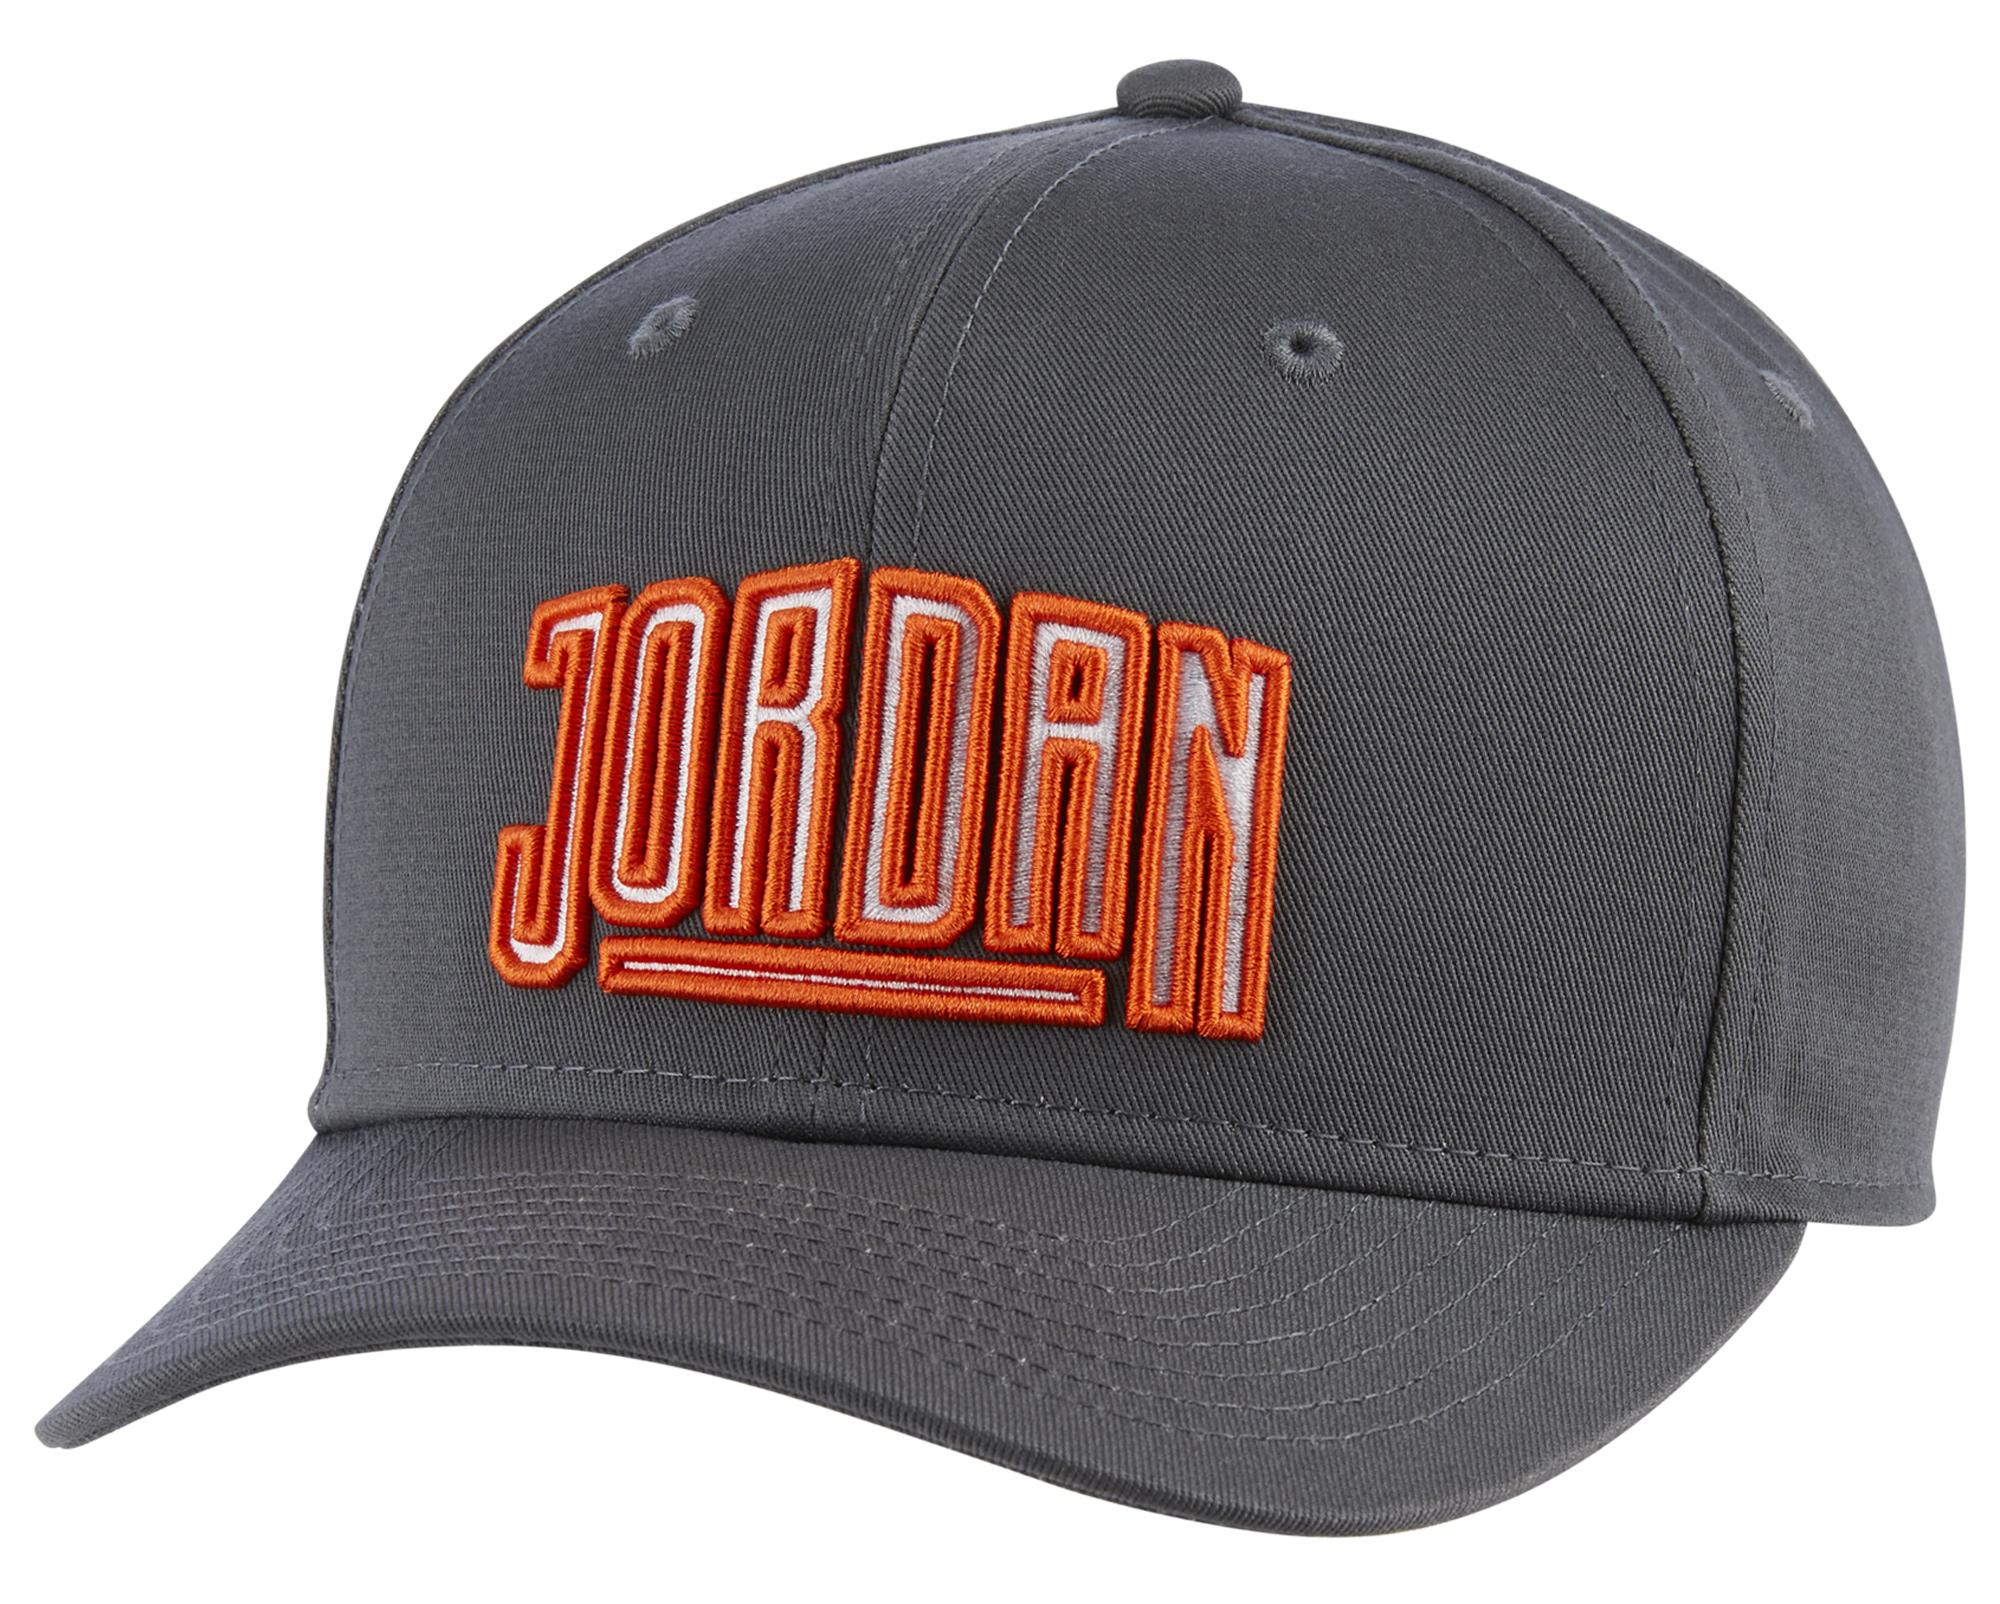 jordan-force-snapback-hat-grey-orange-1